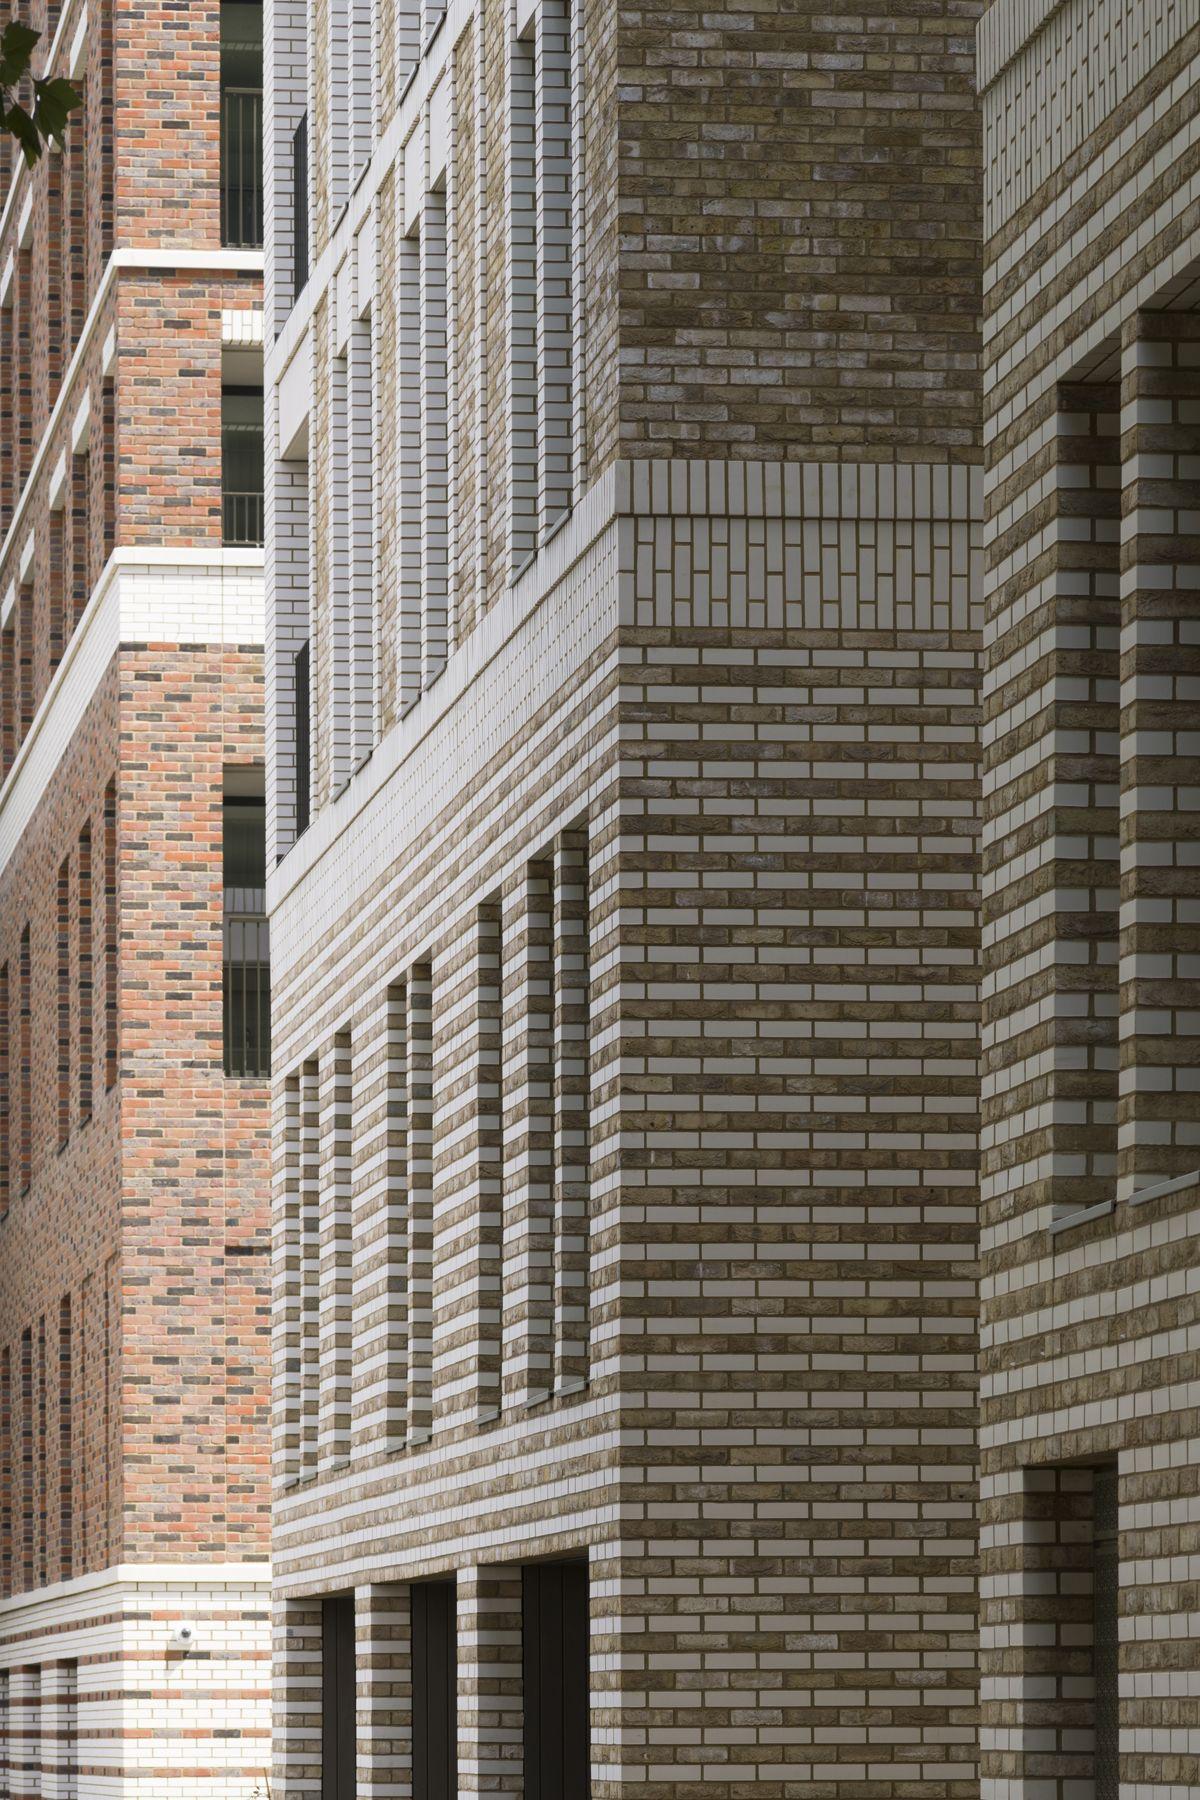 Pflegeheim innenarchitektur maccreanor lavington wins the supreme award with south gardens at